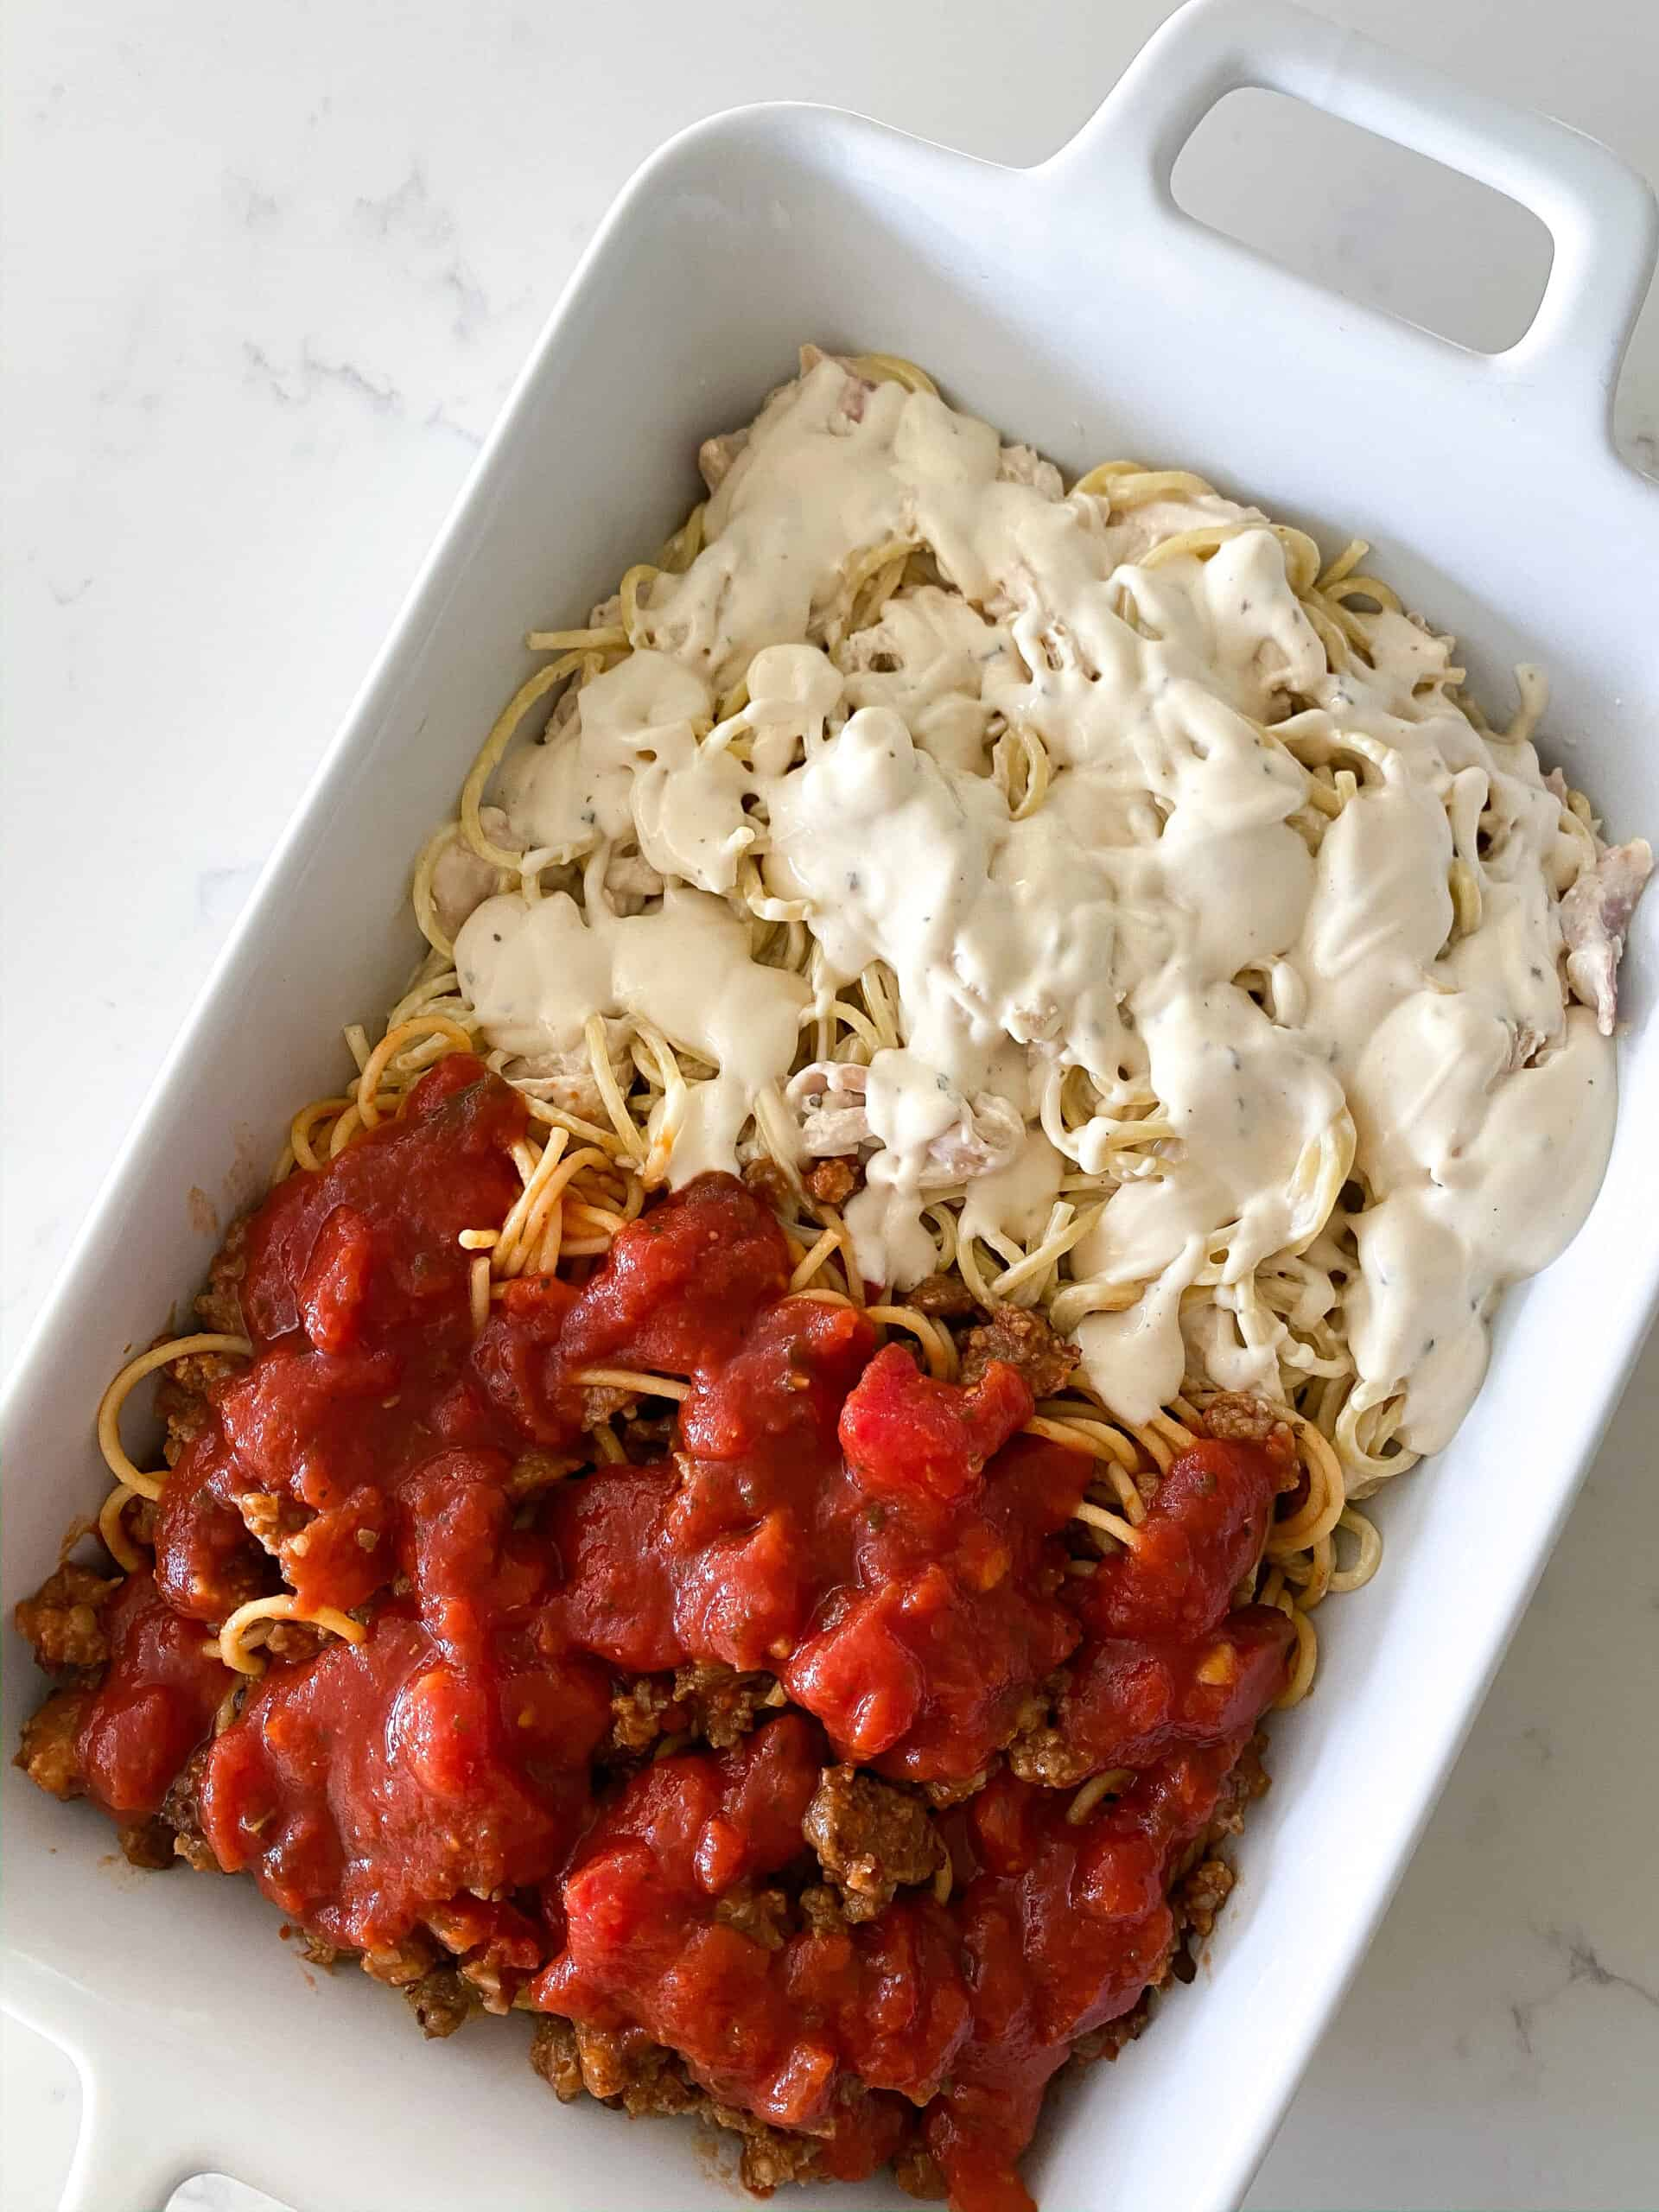 baked spaghetti in baking dish ready to bake